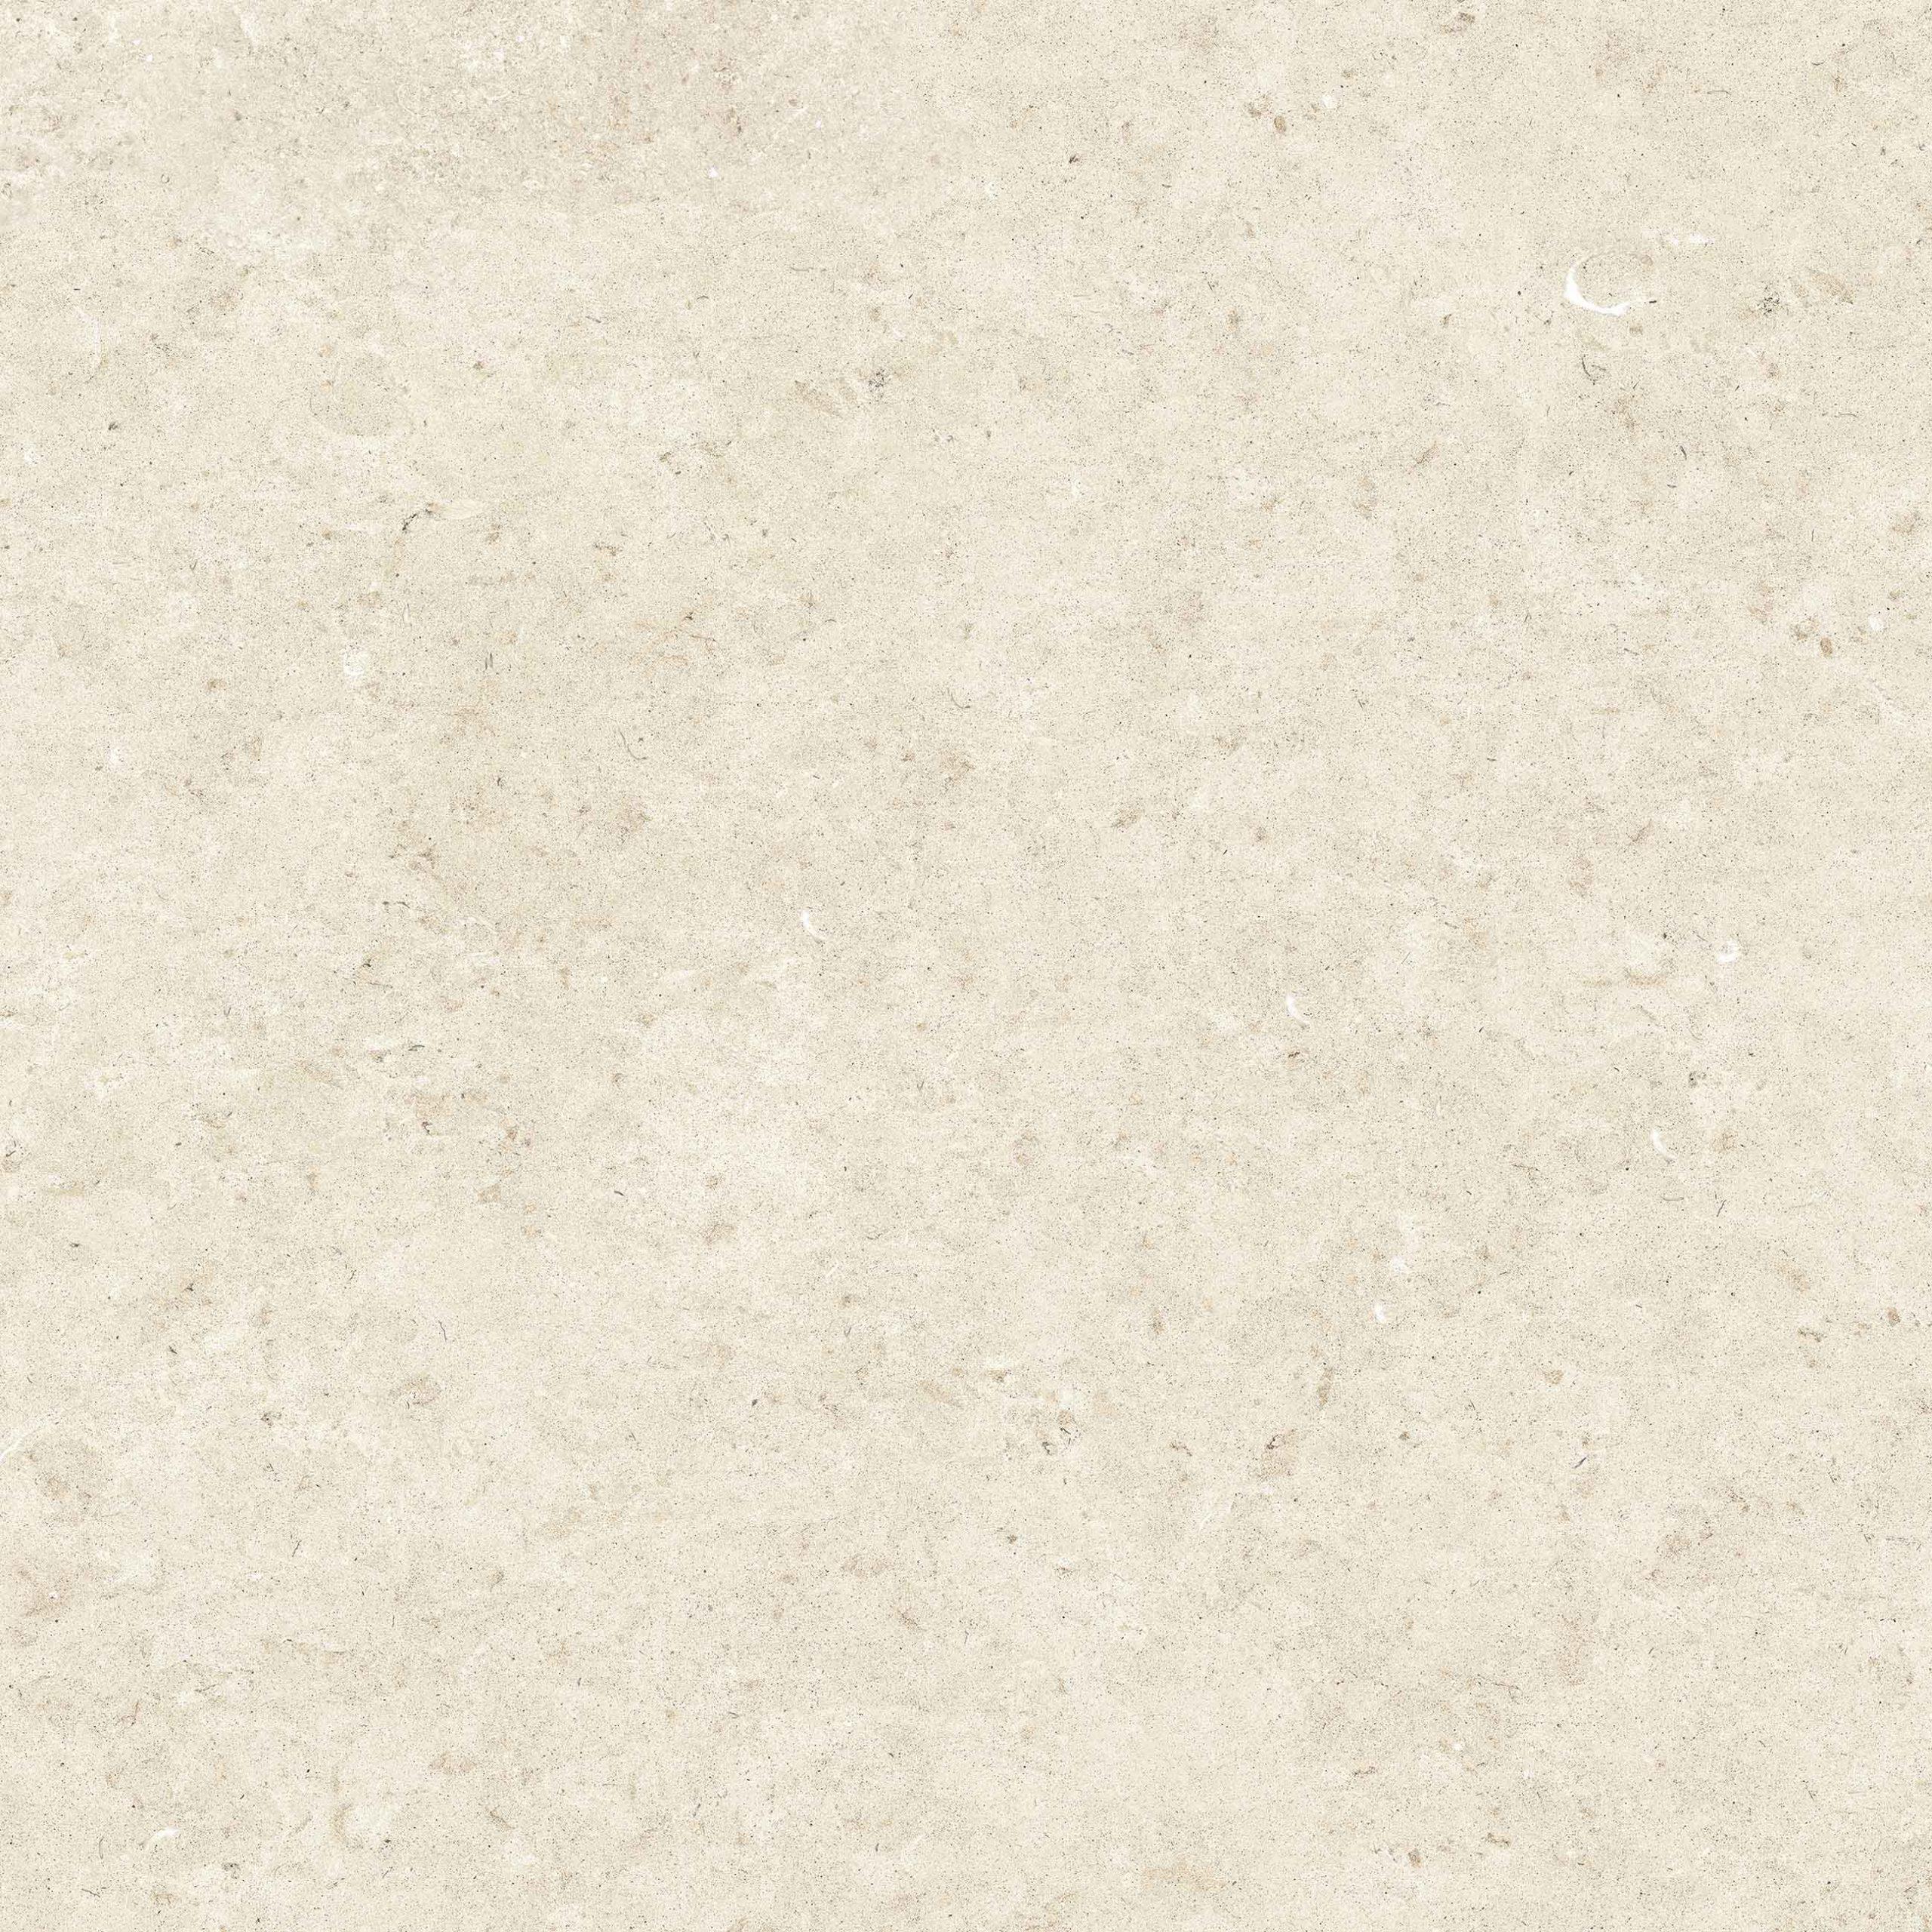 Stontech 4.0 Stone 02 R+PTV 6mm 120 x 120